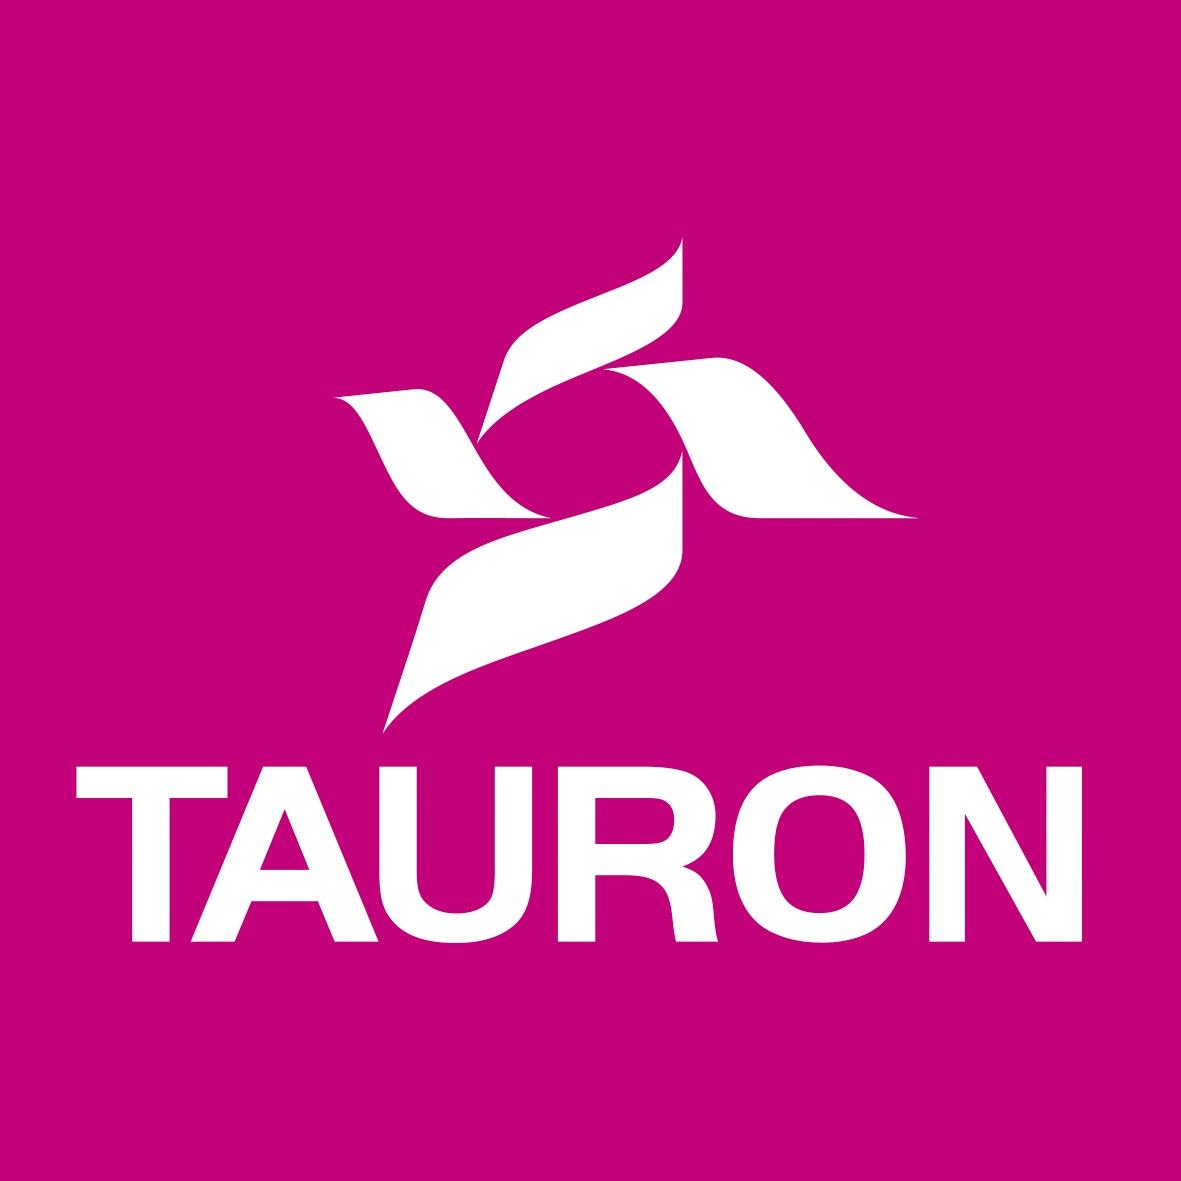 TAURON_LOGO_PROMOCYJNE_PIONOWE_CS4